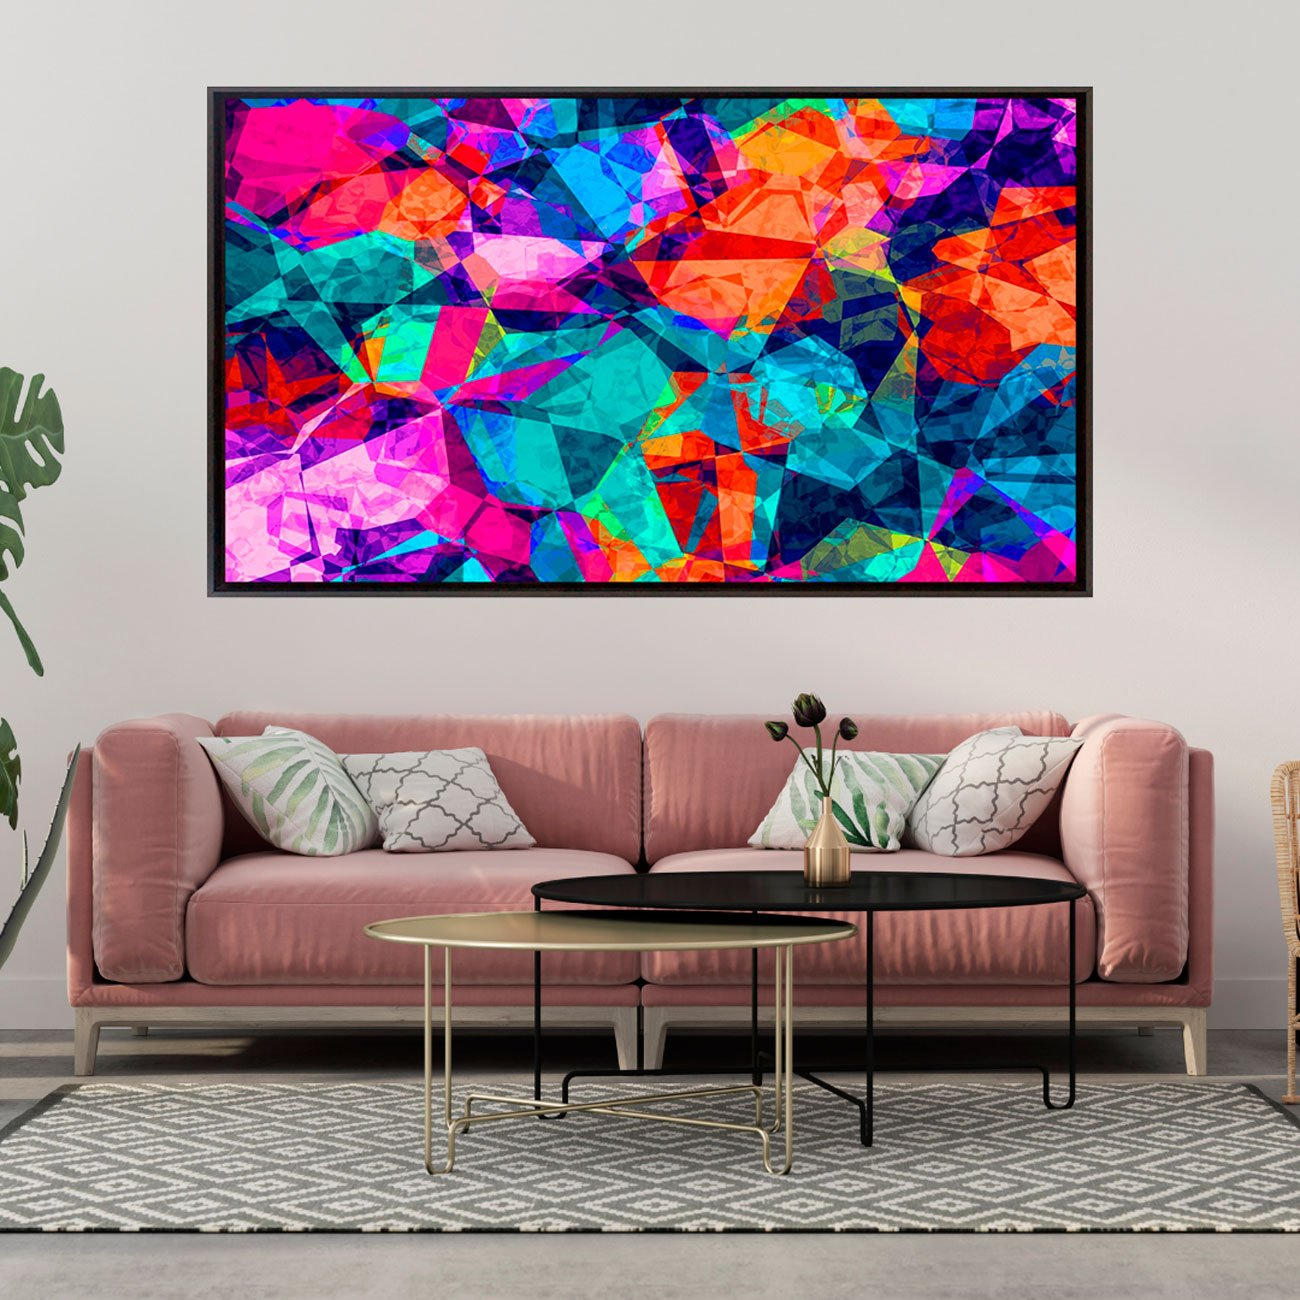 Quadro Tela Canvas Emoldurada Abstrato Colors 200x120cm